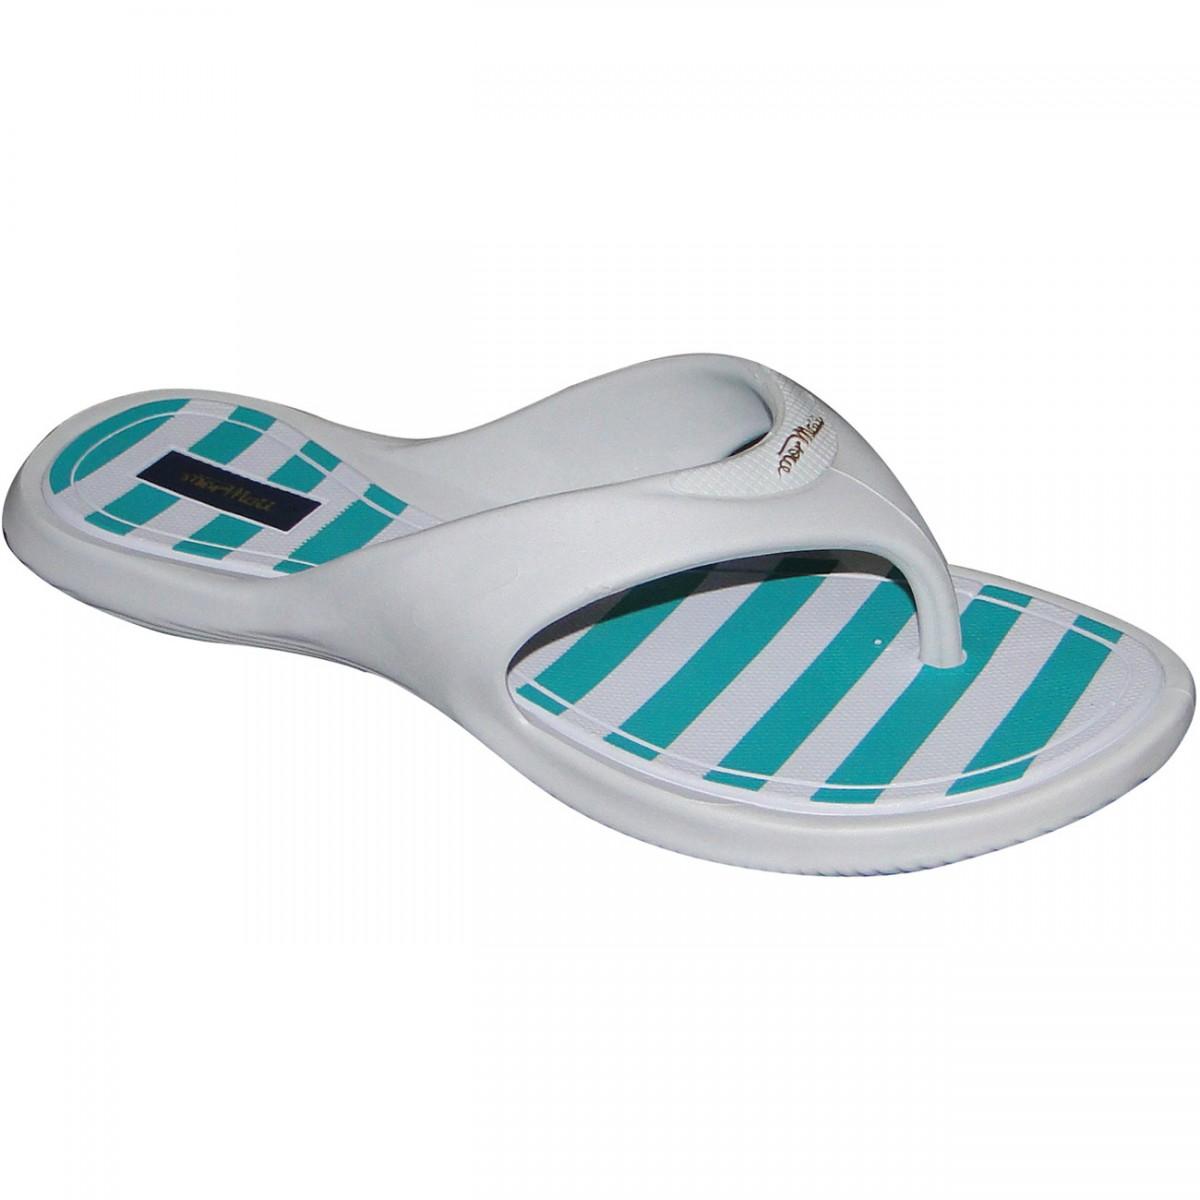 926fcd668 Chinelo Mormaii Ref.10627 6492 - Branco/Verde - Chuteira Nike ...